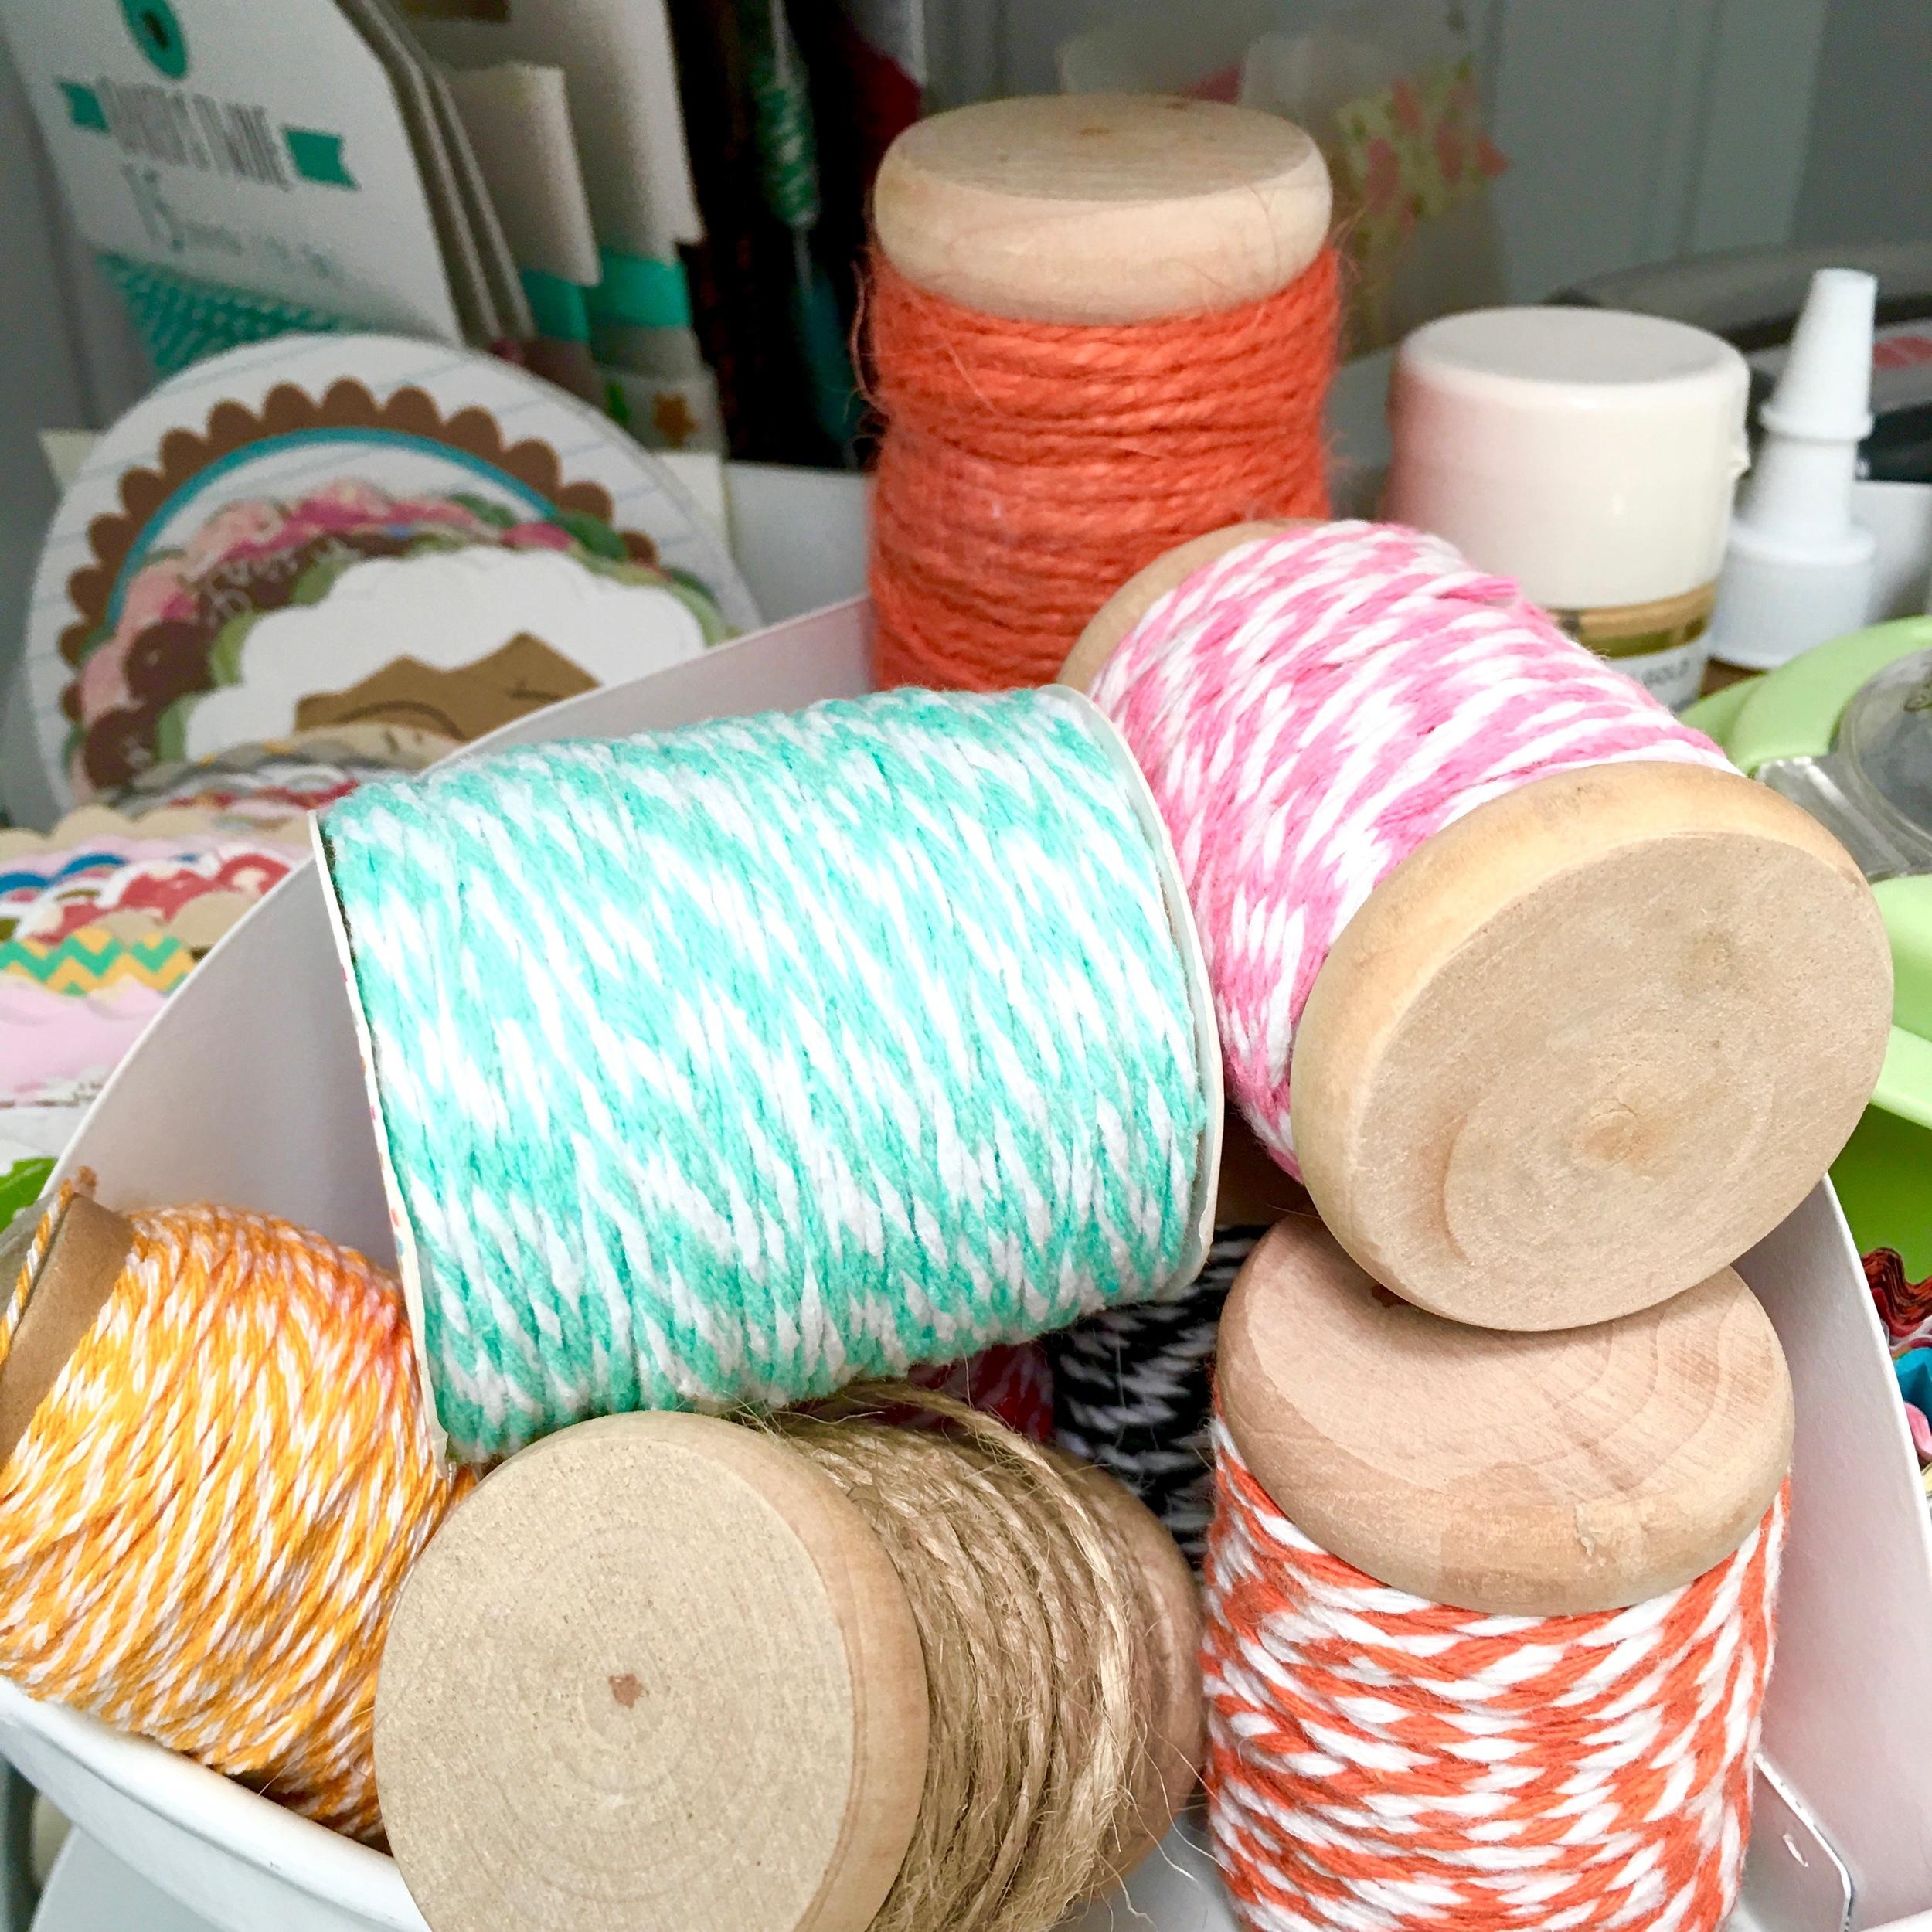 twine-craft-room-organization-scrapbooking-supplies-a-peach-life